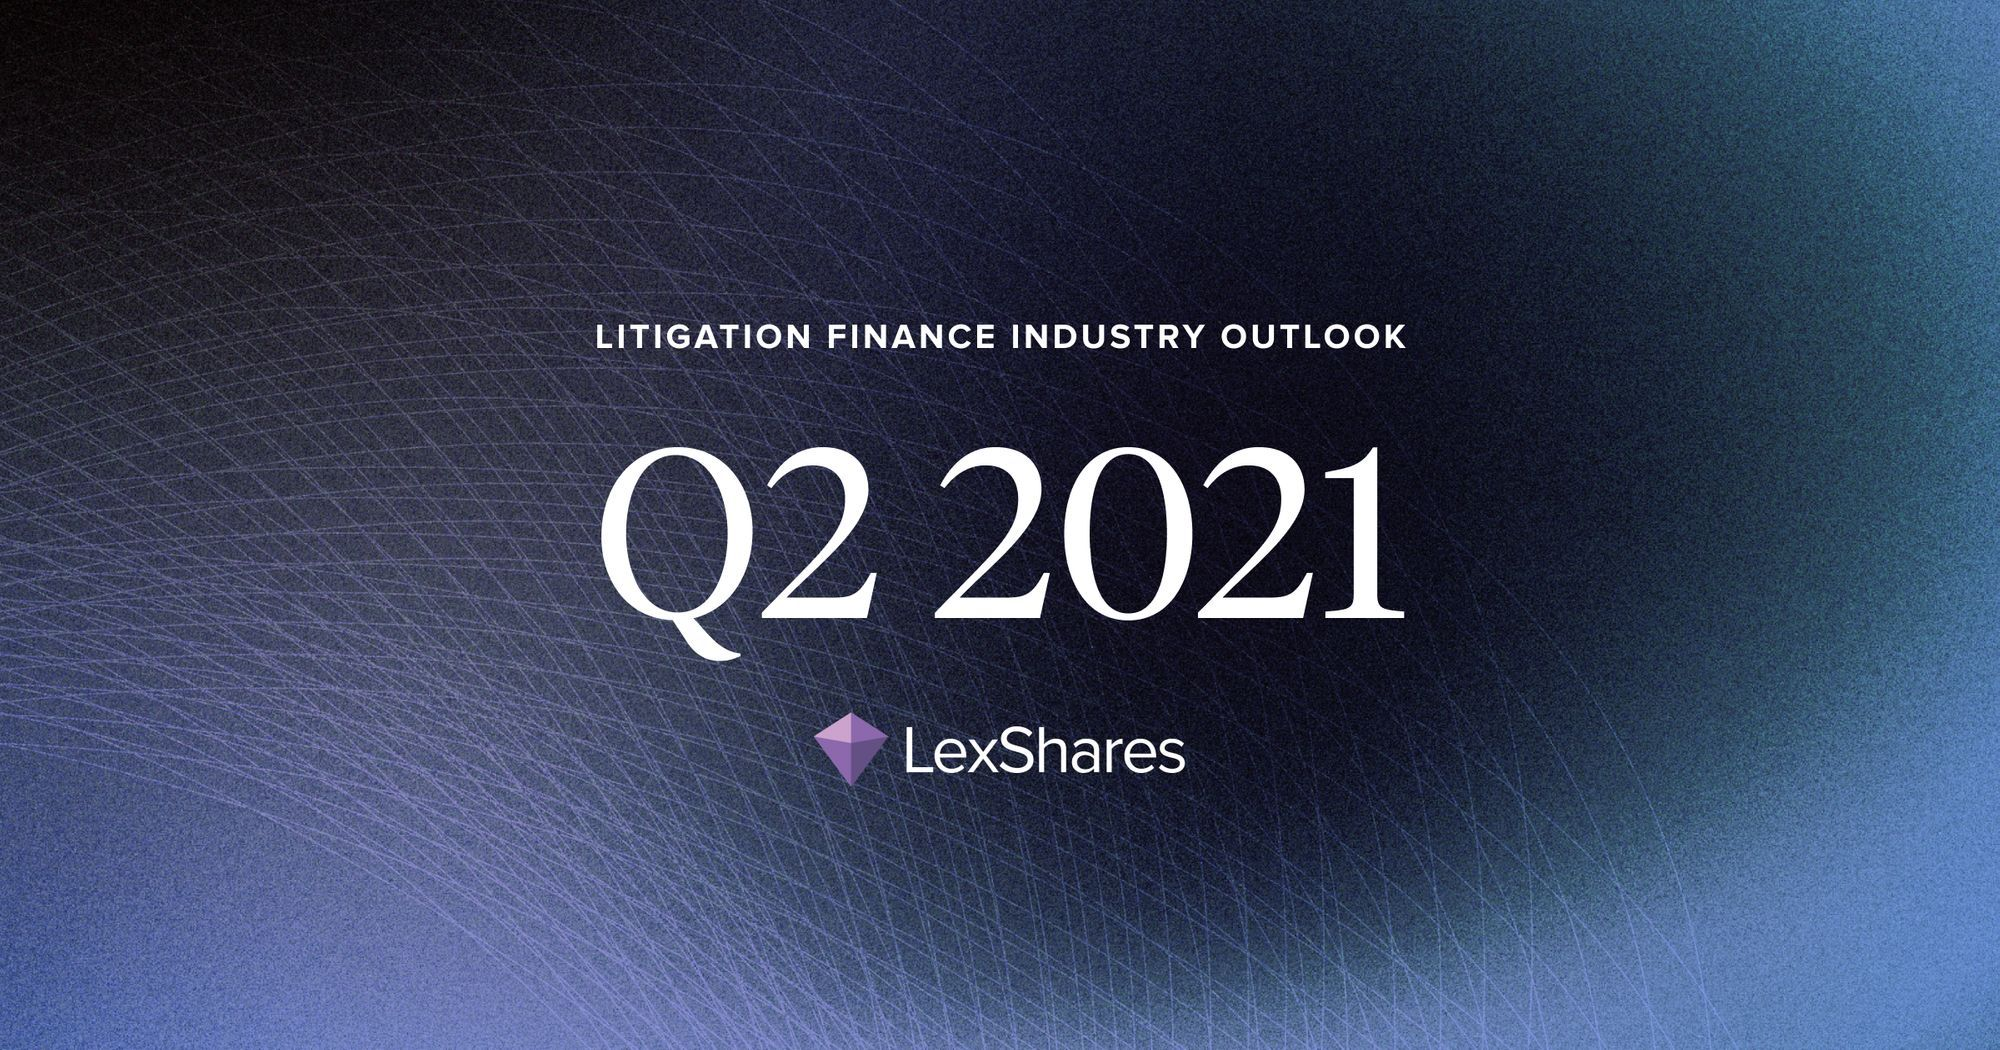 Litigation Finance Industry Outlook: Q2 2021